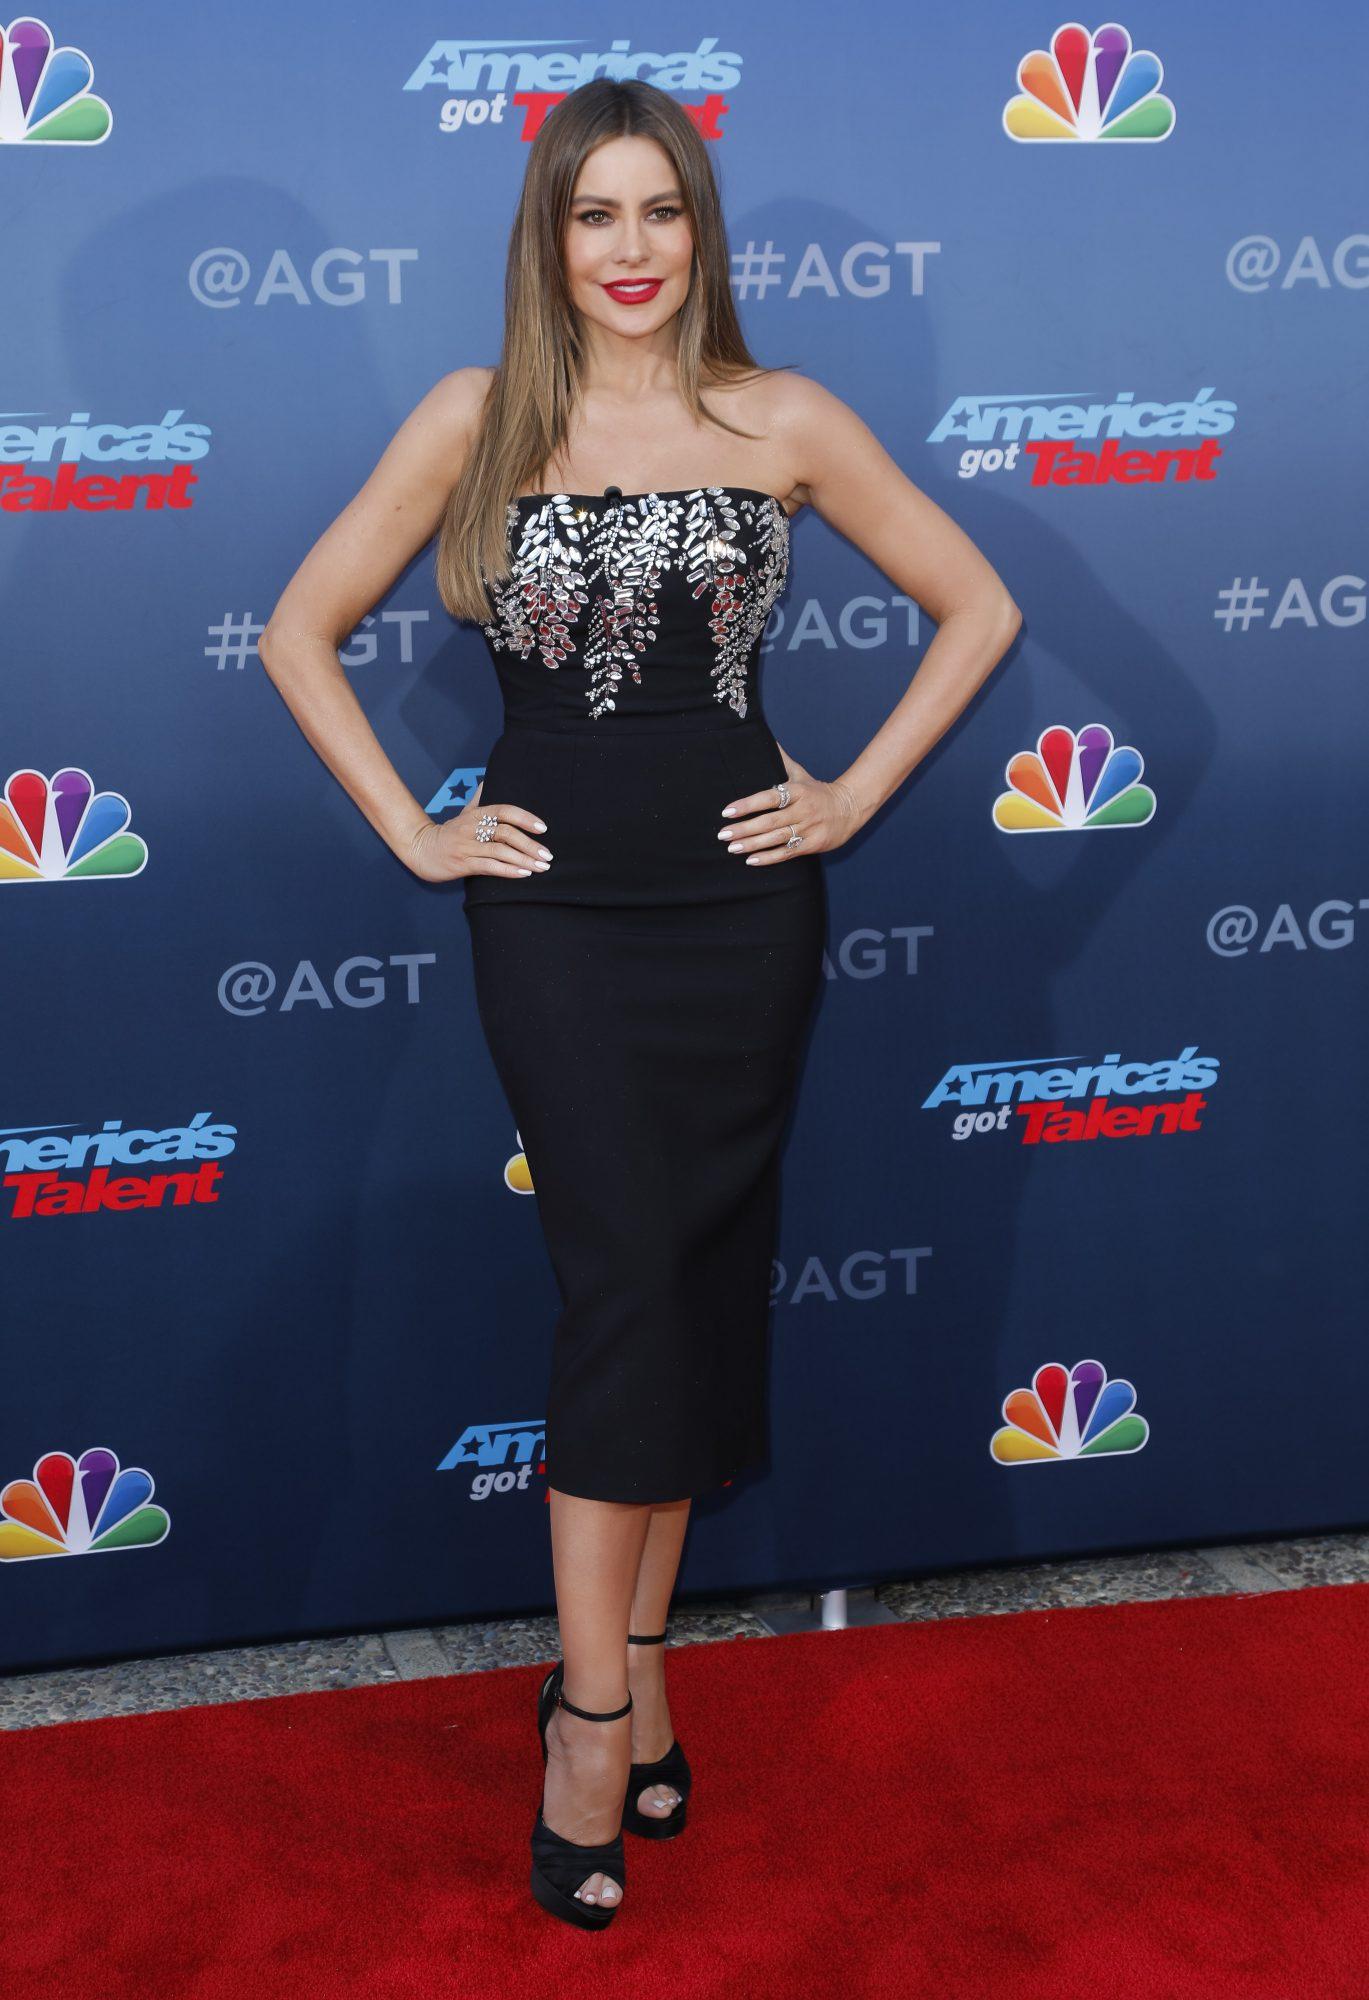 Sofia Vergara, premier, america's got talent, look, pasadena, caifornia